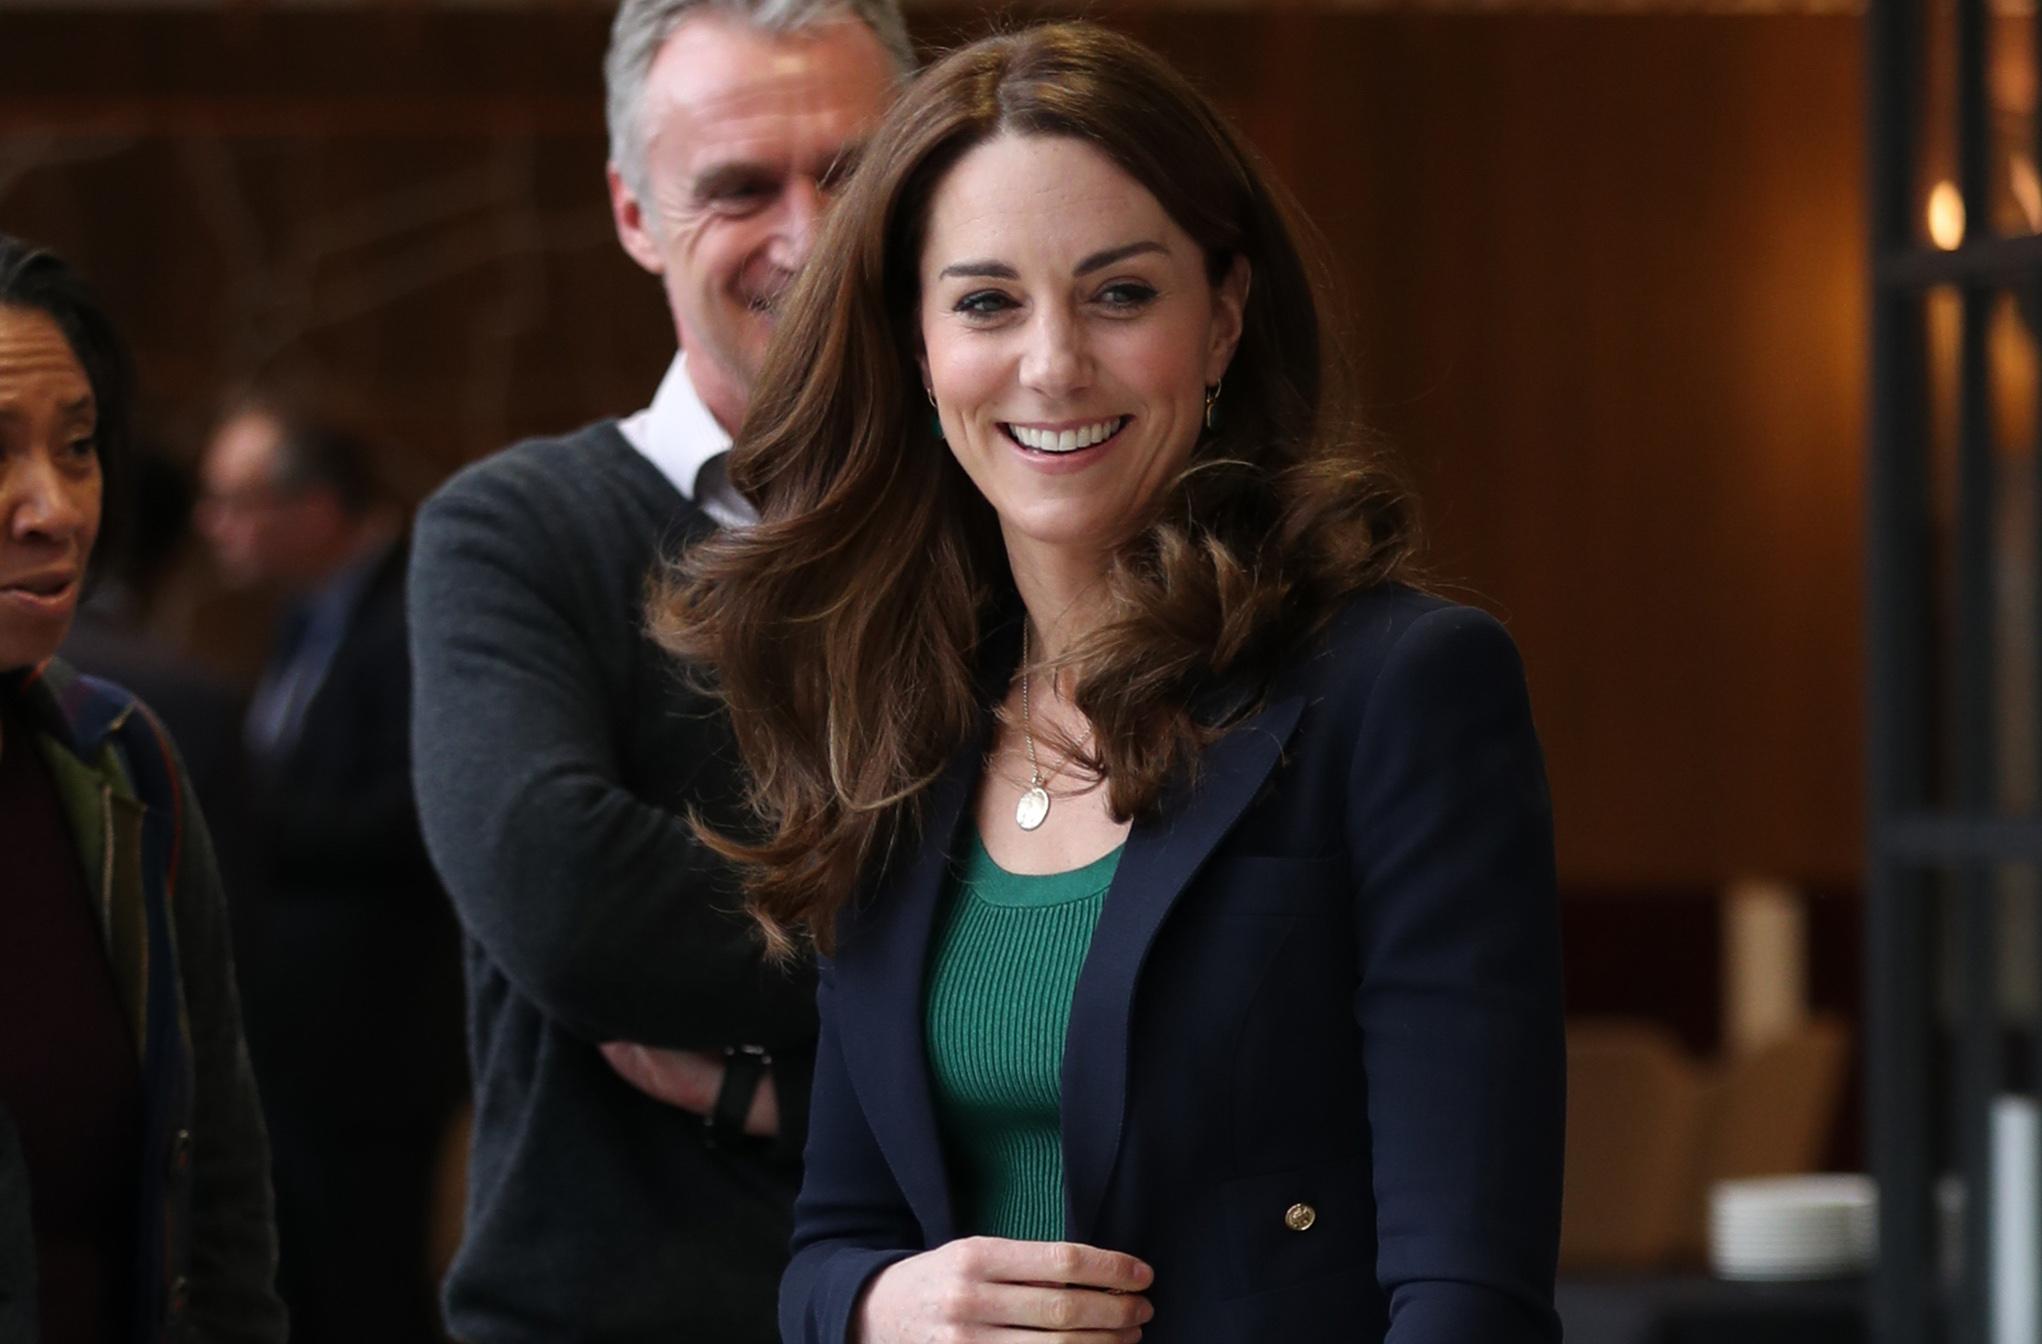 The Duchess of Cambridge - cover